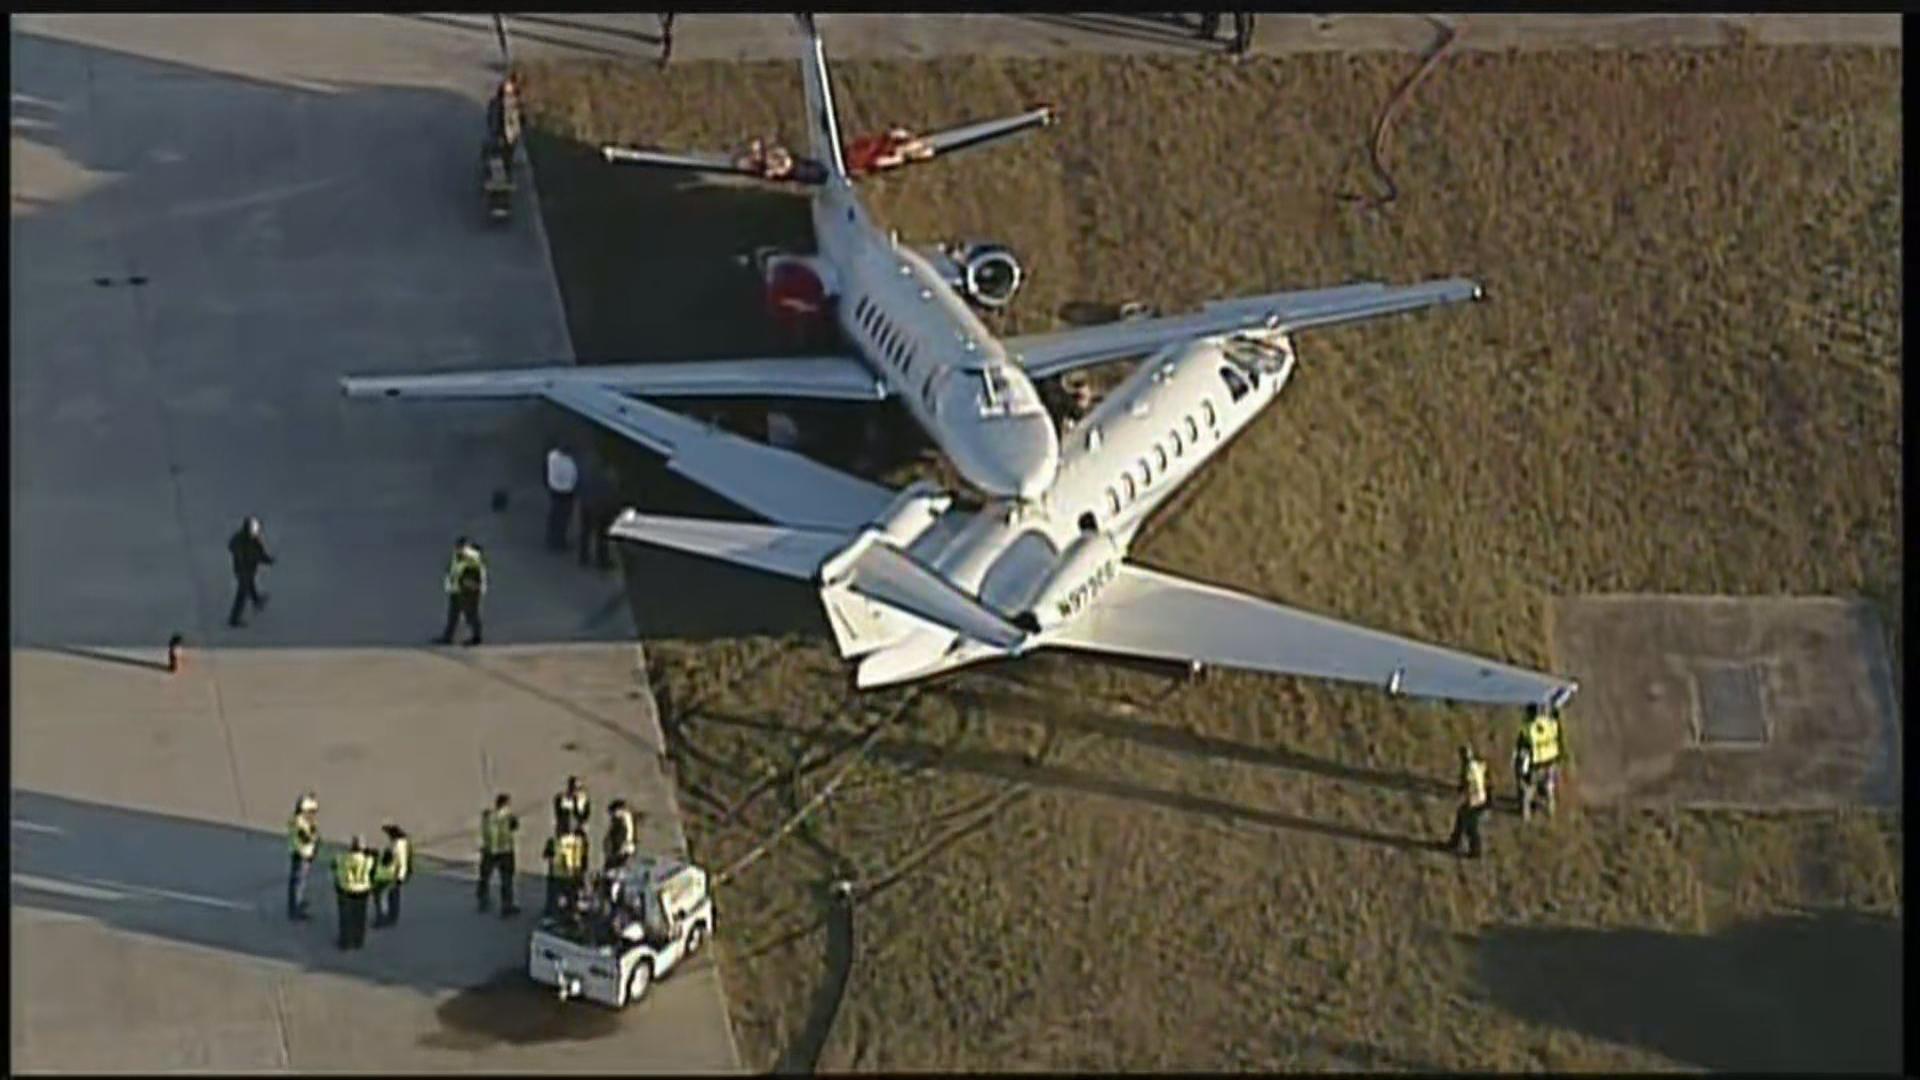 SAN ANTONIO AIRPORT PLANE CRASH_frame_35693